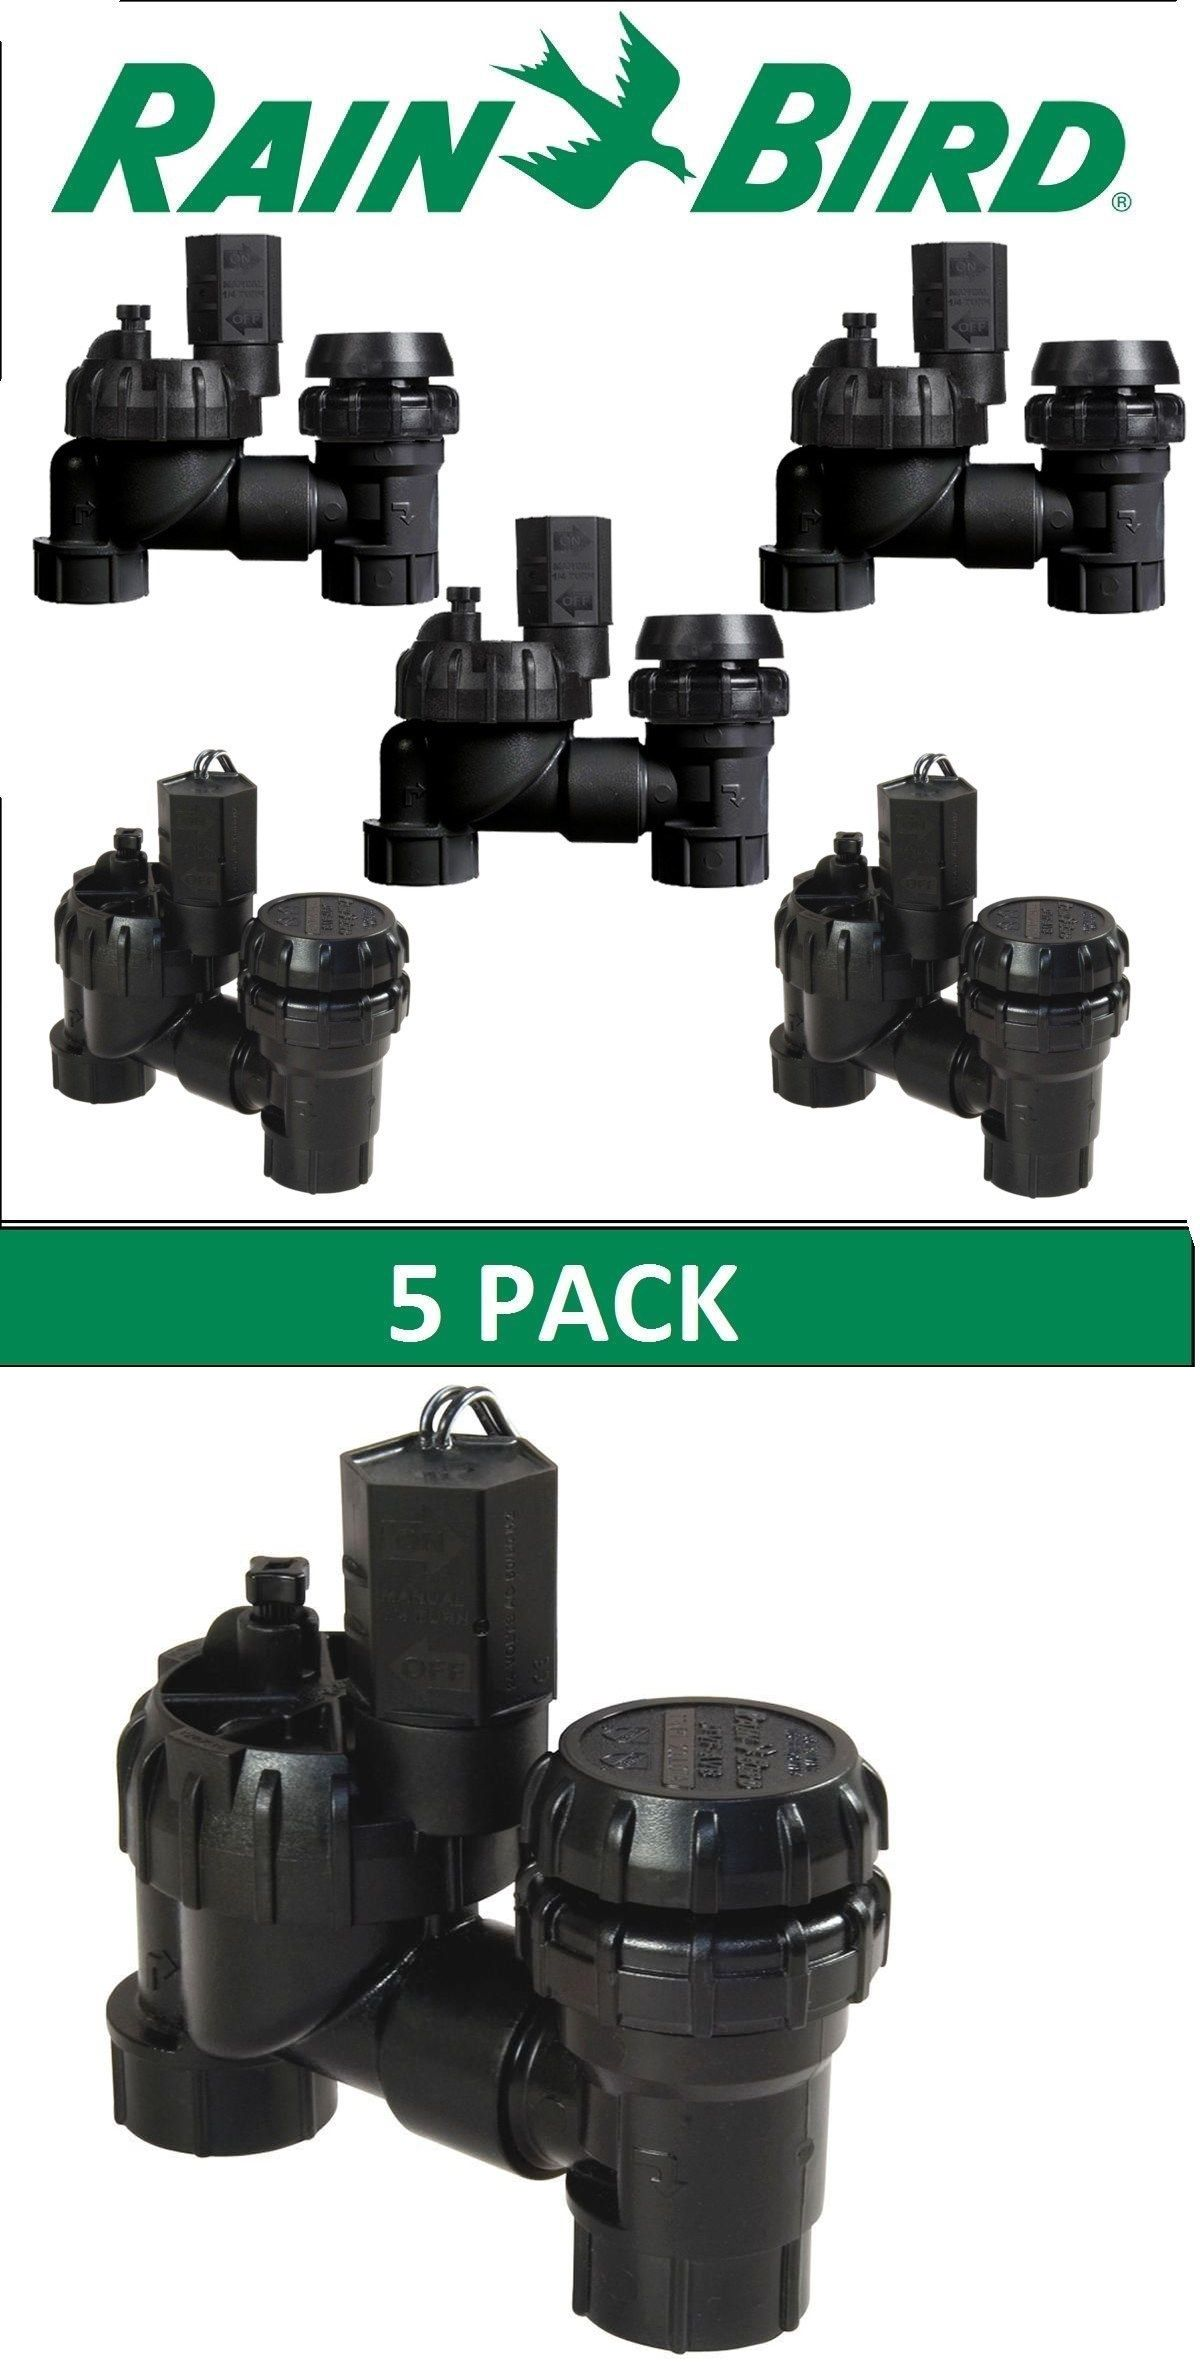 Valves 75673 5 Pack Of Rainbird Jtv As 075 Anti Siphon Jar Top Sprinkler Valves 3 4 Buy It Now Only 72 95 On Ebay Val Rain Bird Sprinkler Valves Siphon